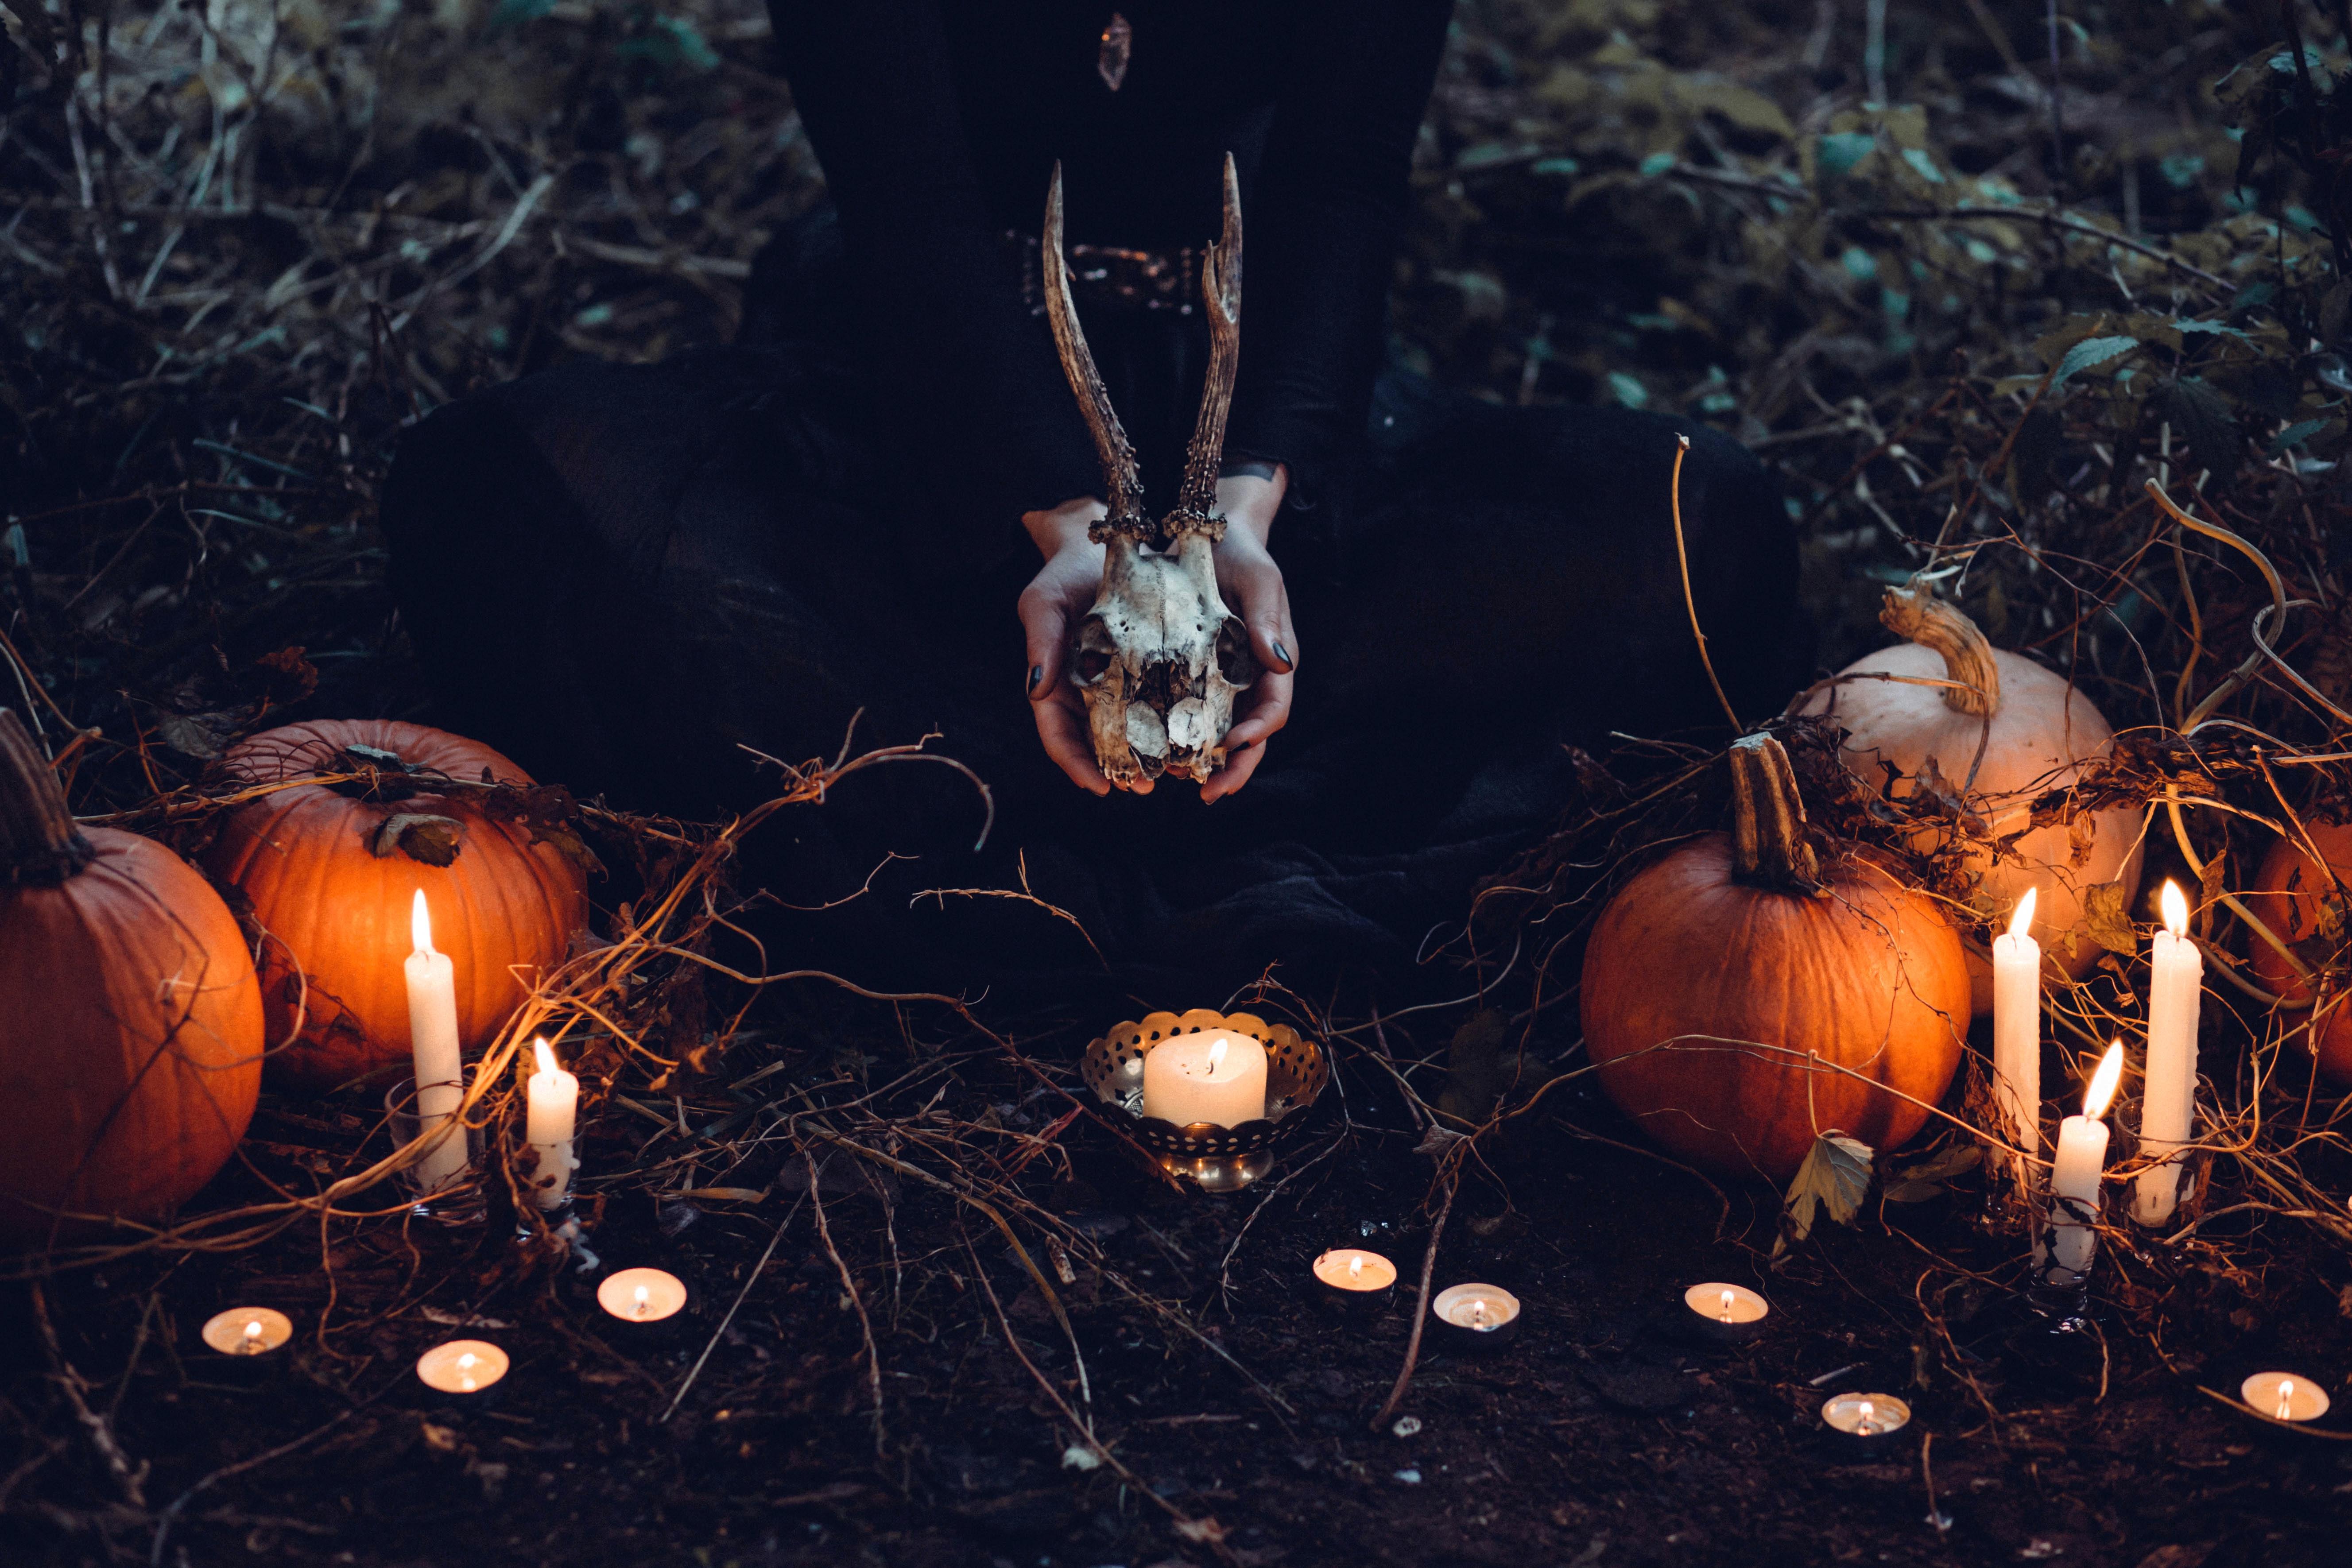 brown-pumpkin-halloween-decor-and-gray-skull-at-grass-field-211358.jpg